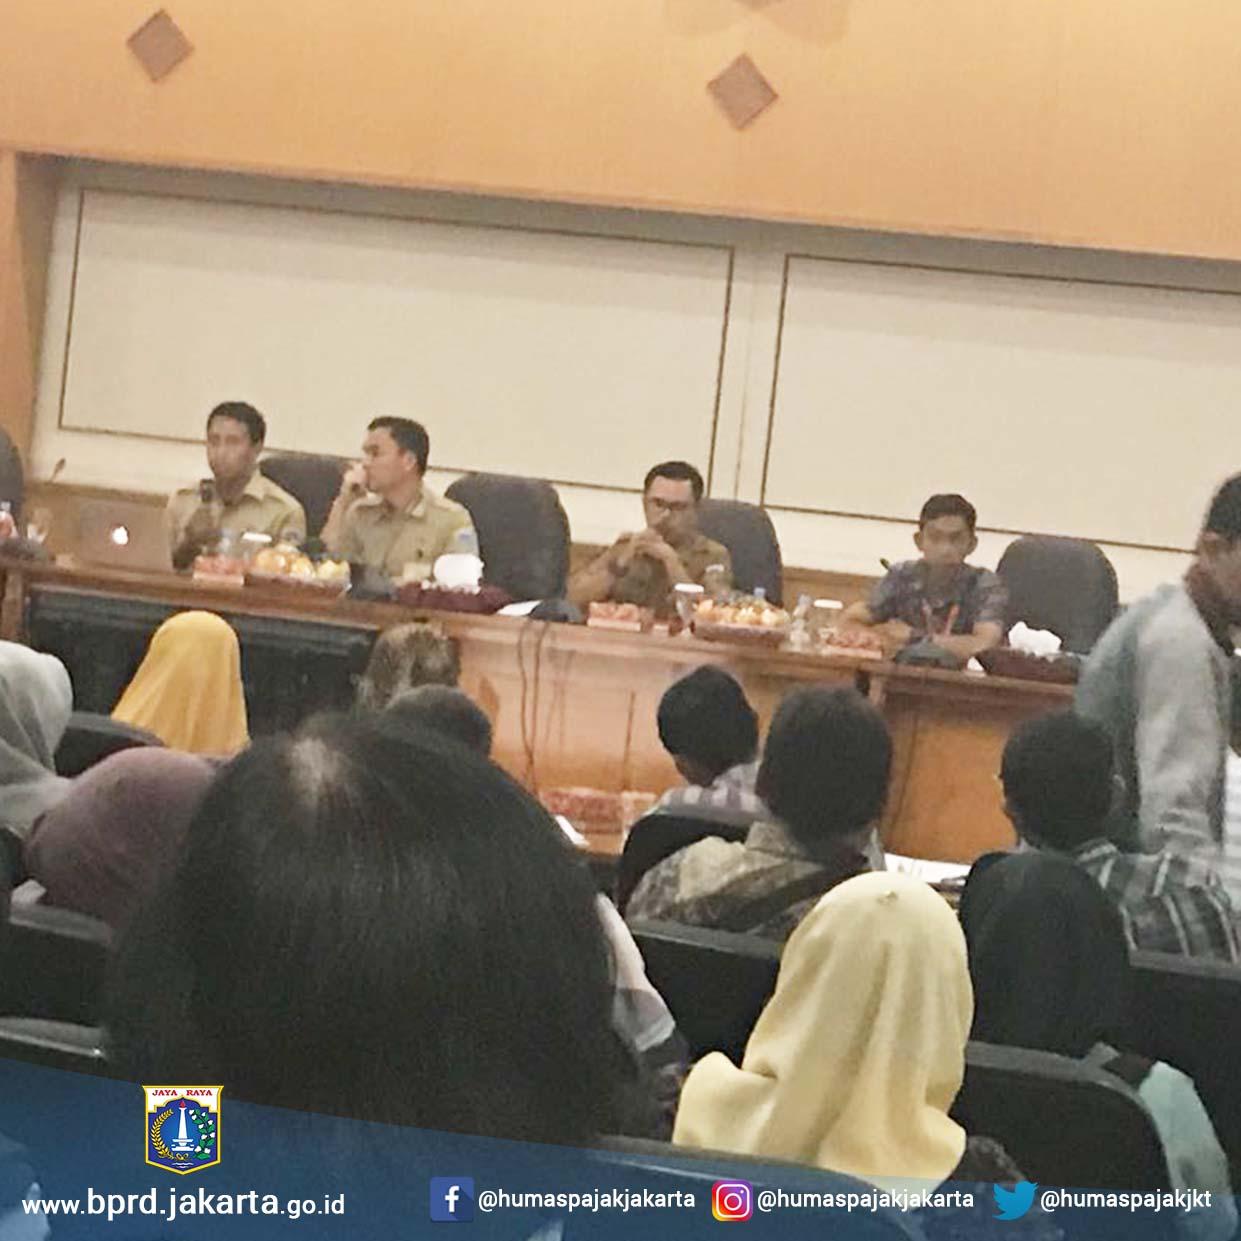 Bimtek Pajak daerah Secara Online di Walikota Jakarta Timur